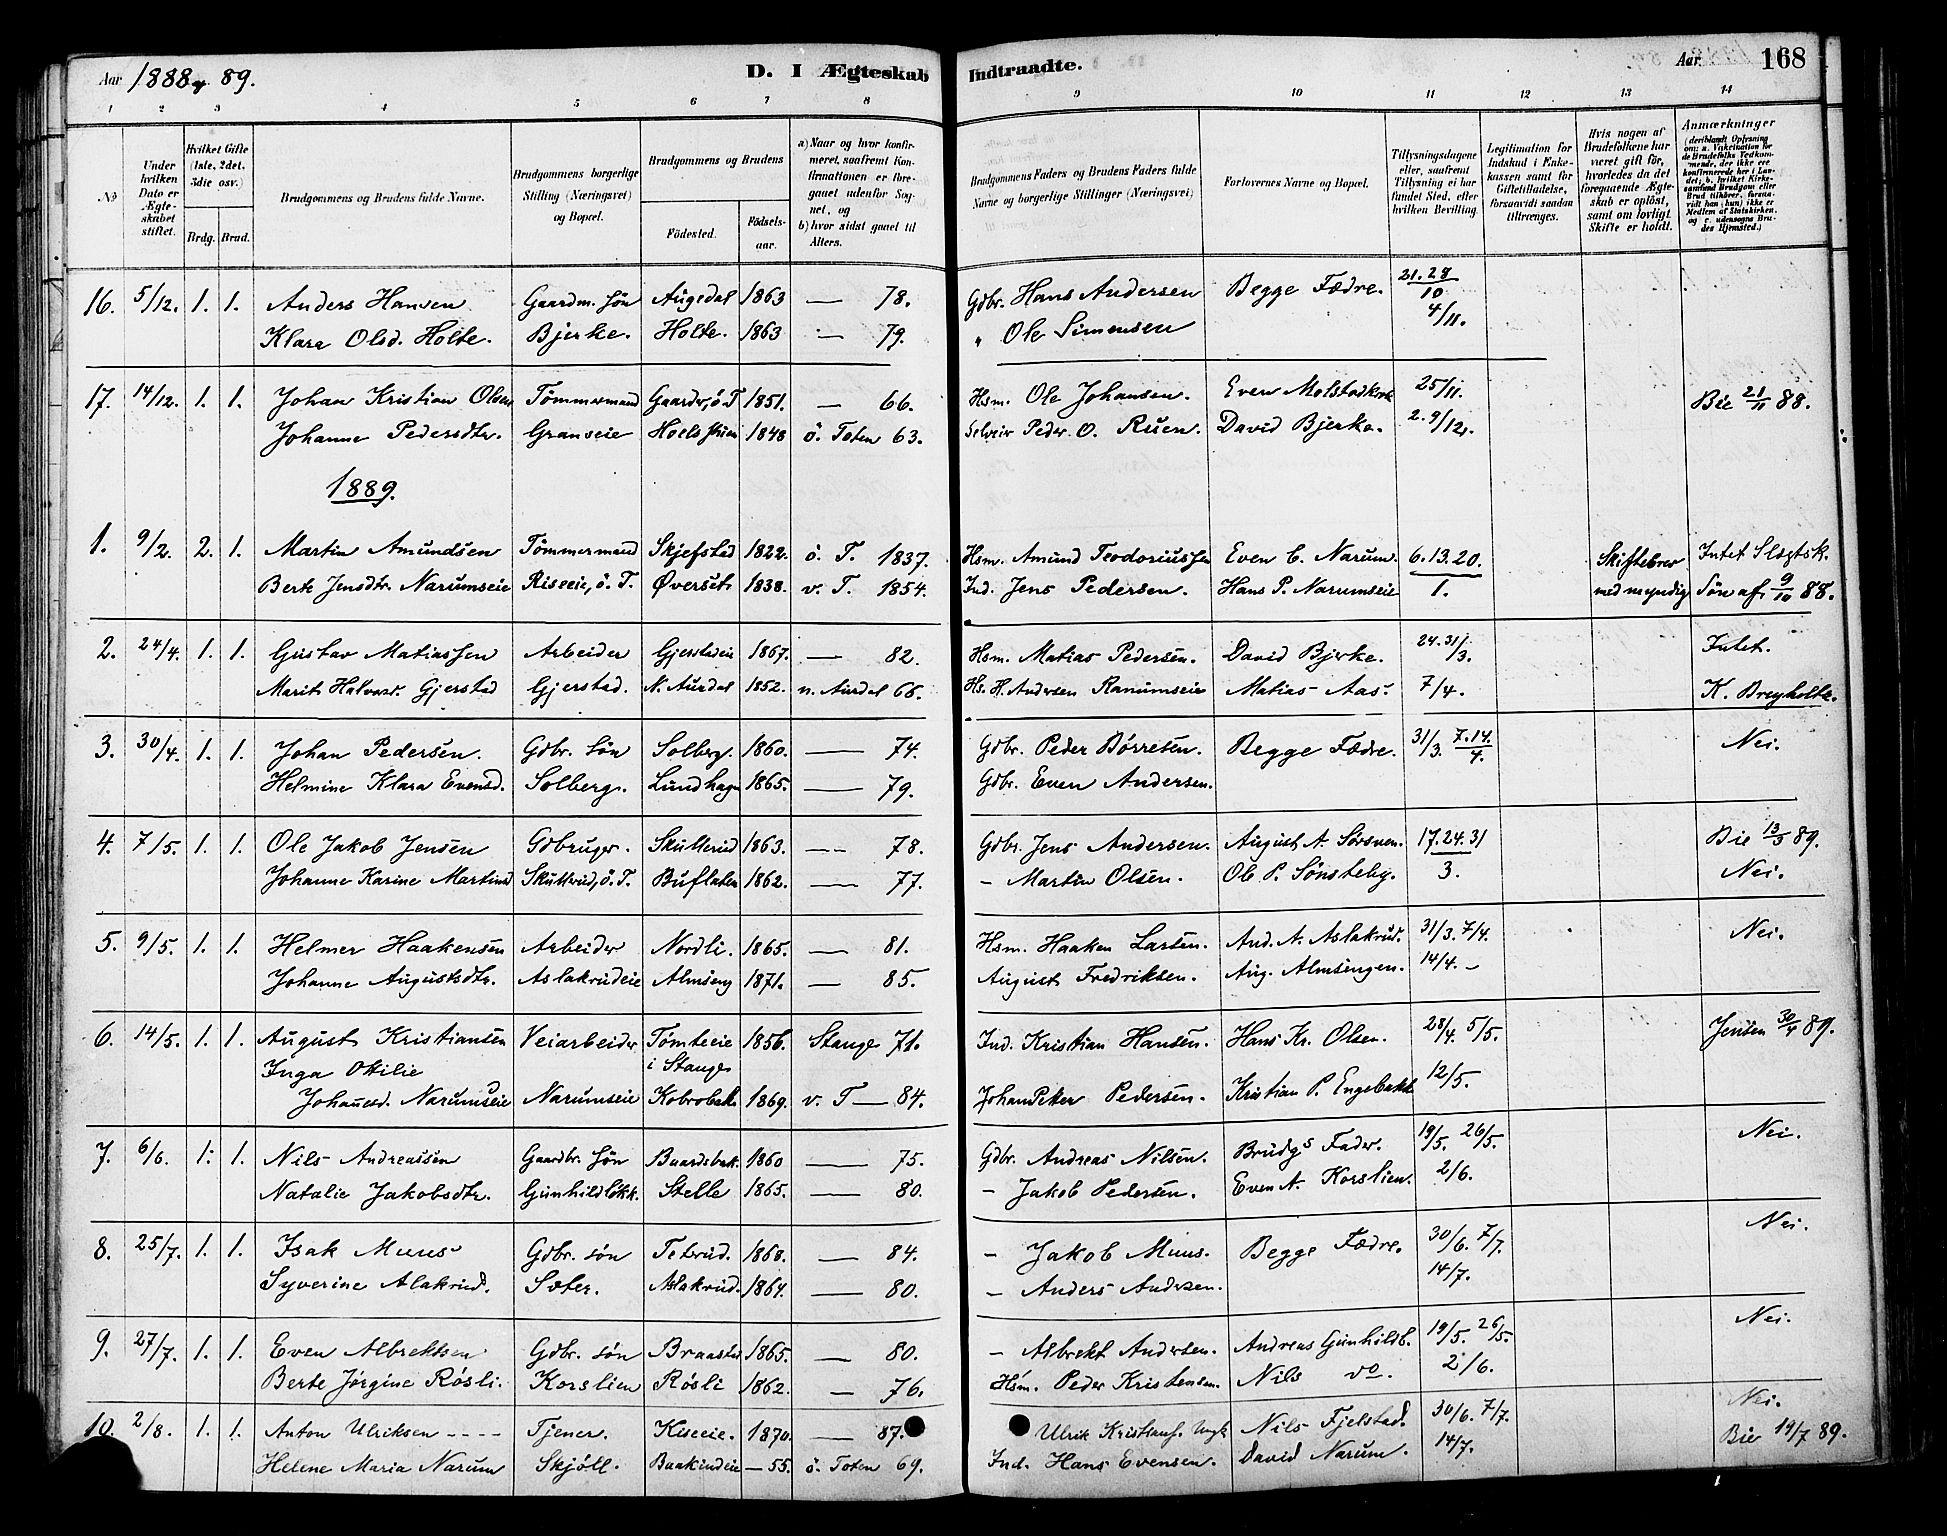 SAH, Vestre Toten prestekontor, H/Ha/Haa/L0010: Ministerialbok nr. 10, 1878-1894, s. 168